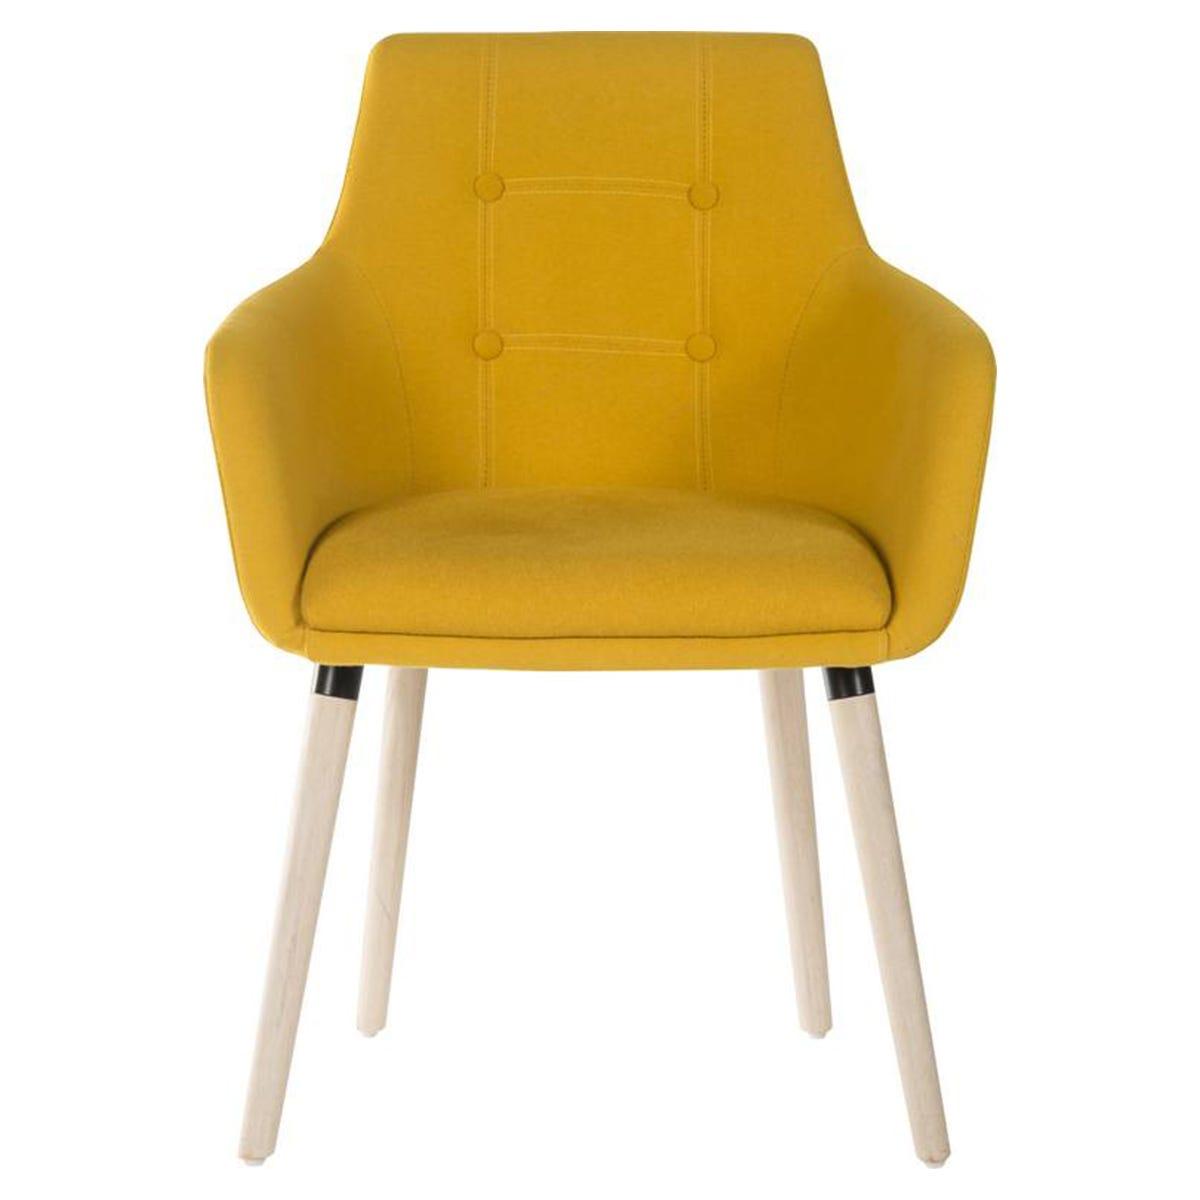 Teknik 4 Legged Soft Padded Office Chair - Yellow